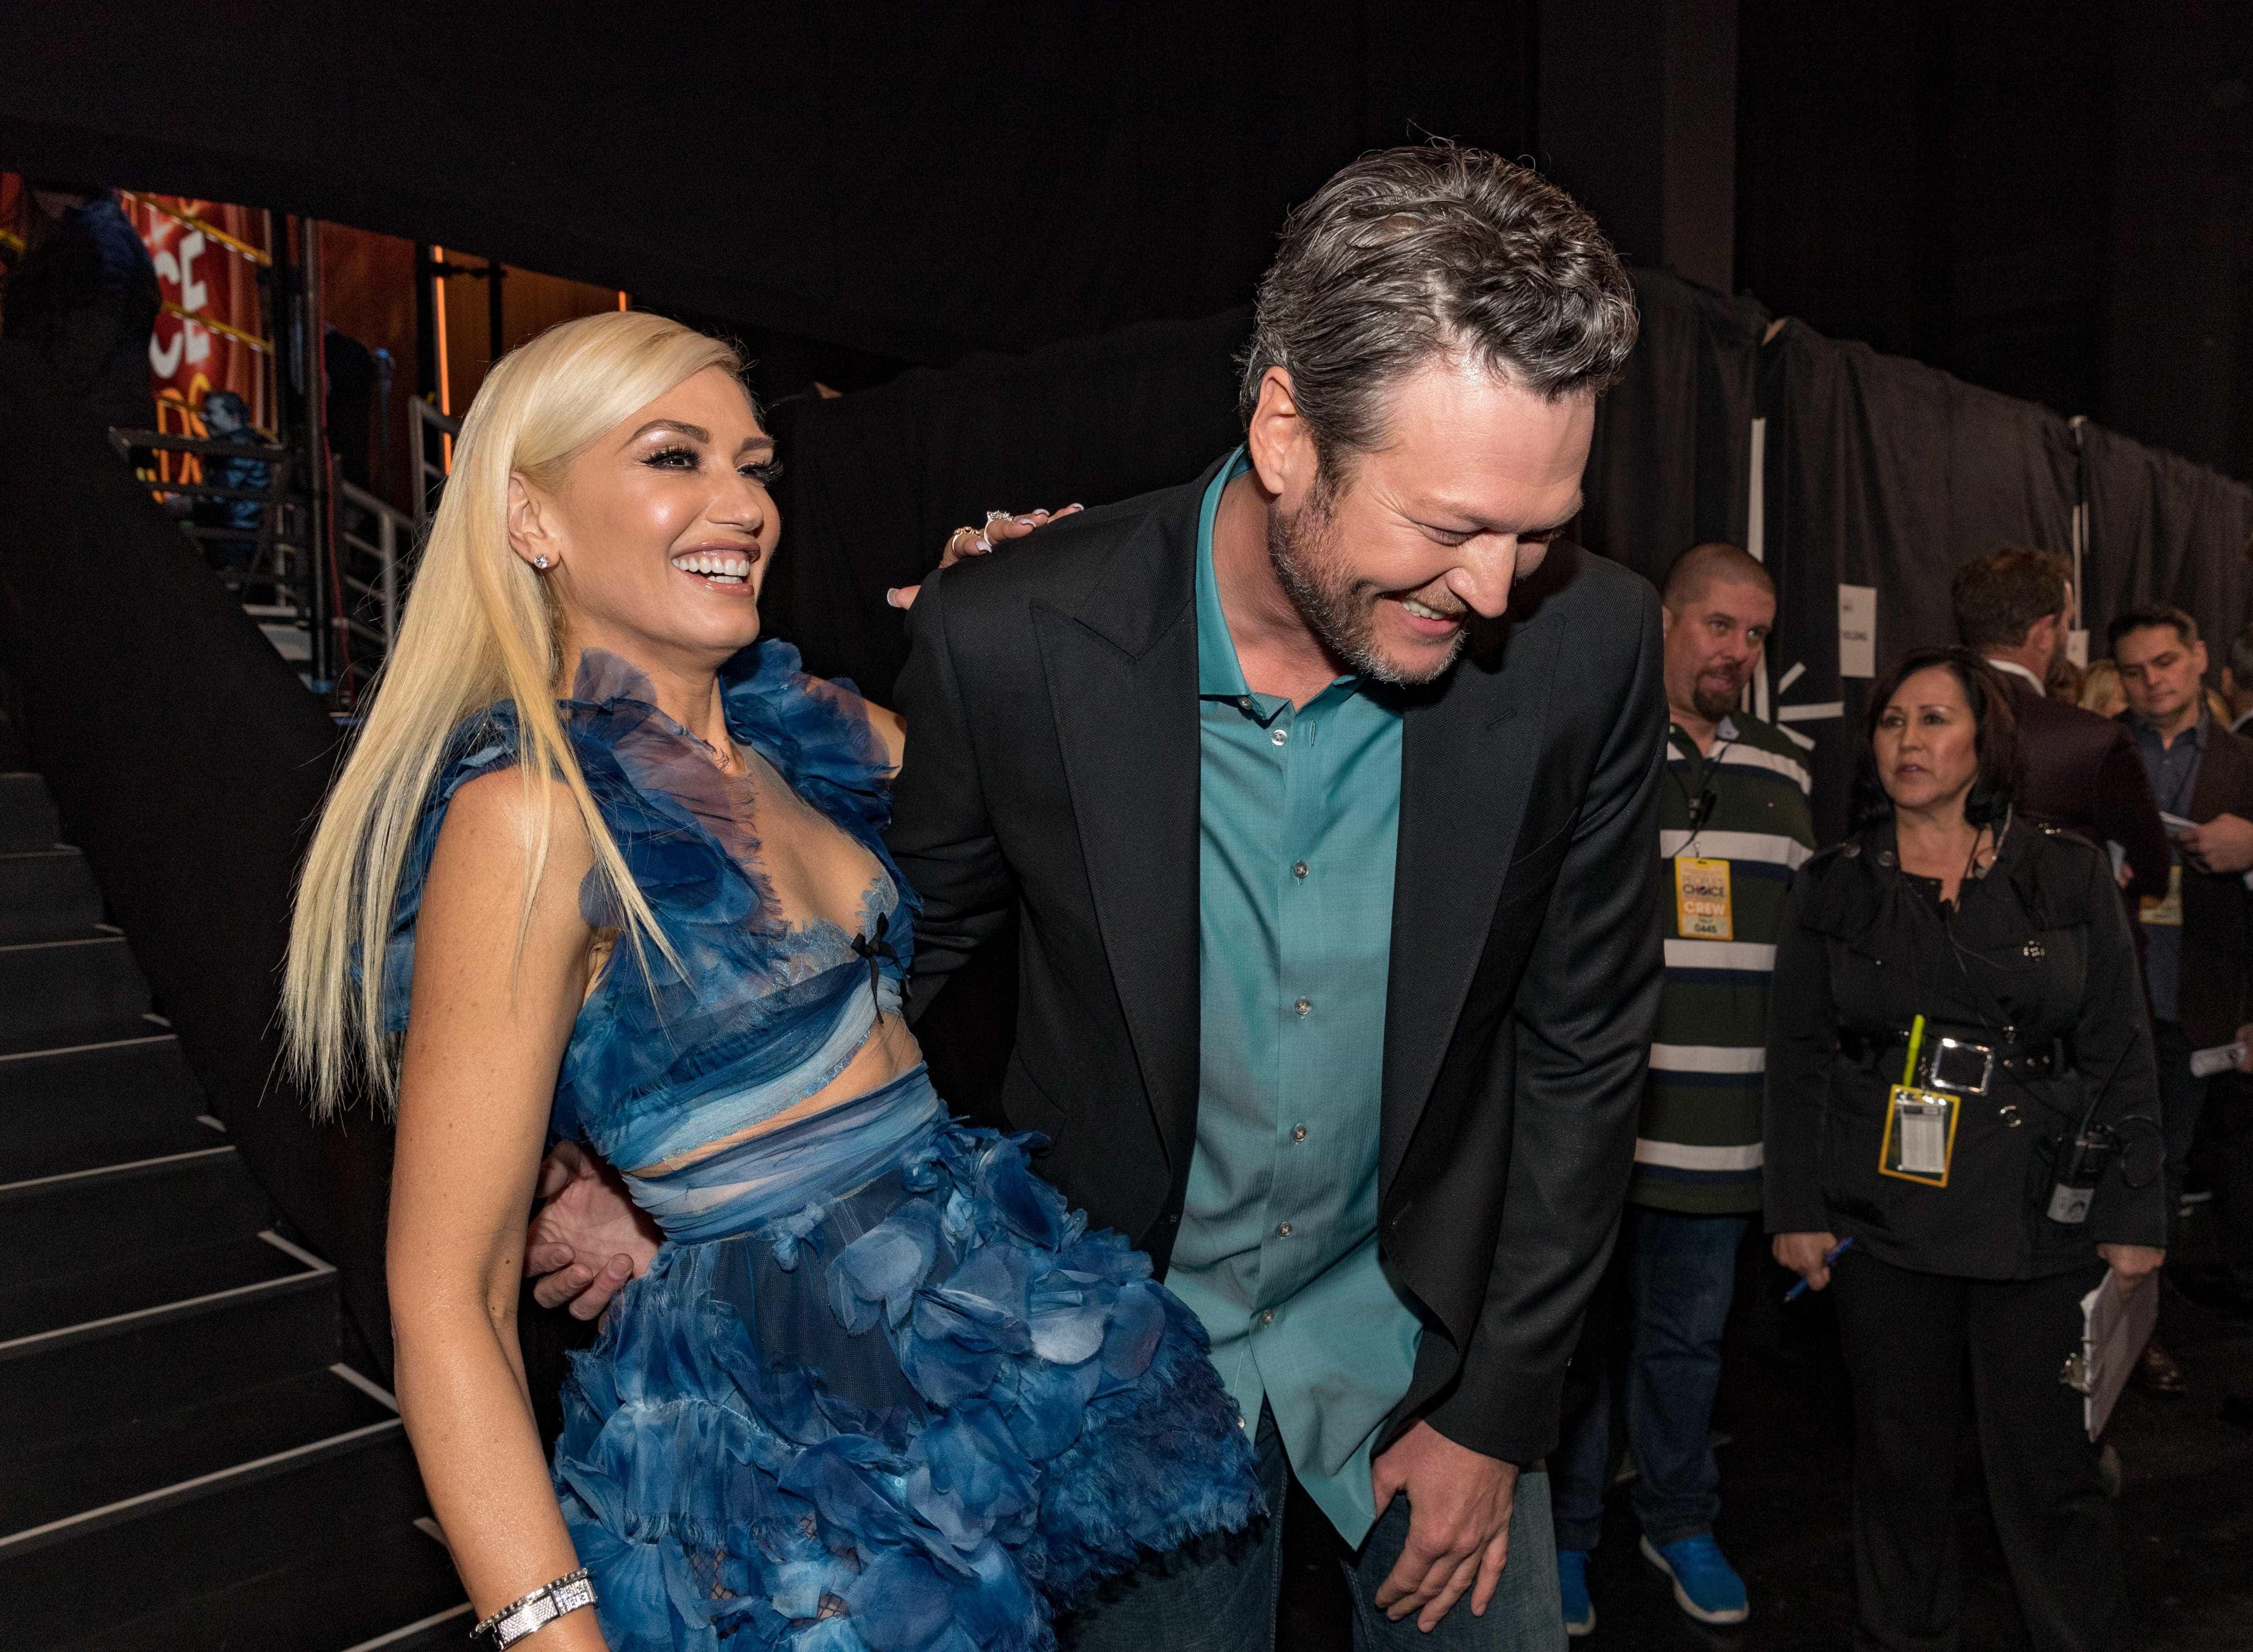 Gwen Stefani e Blake Shelton desfilam juntos em tapete vermelho